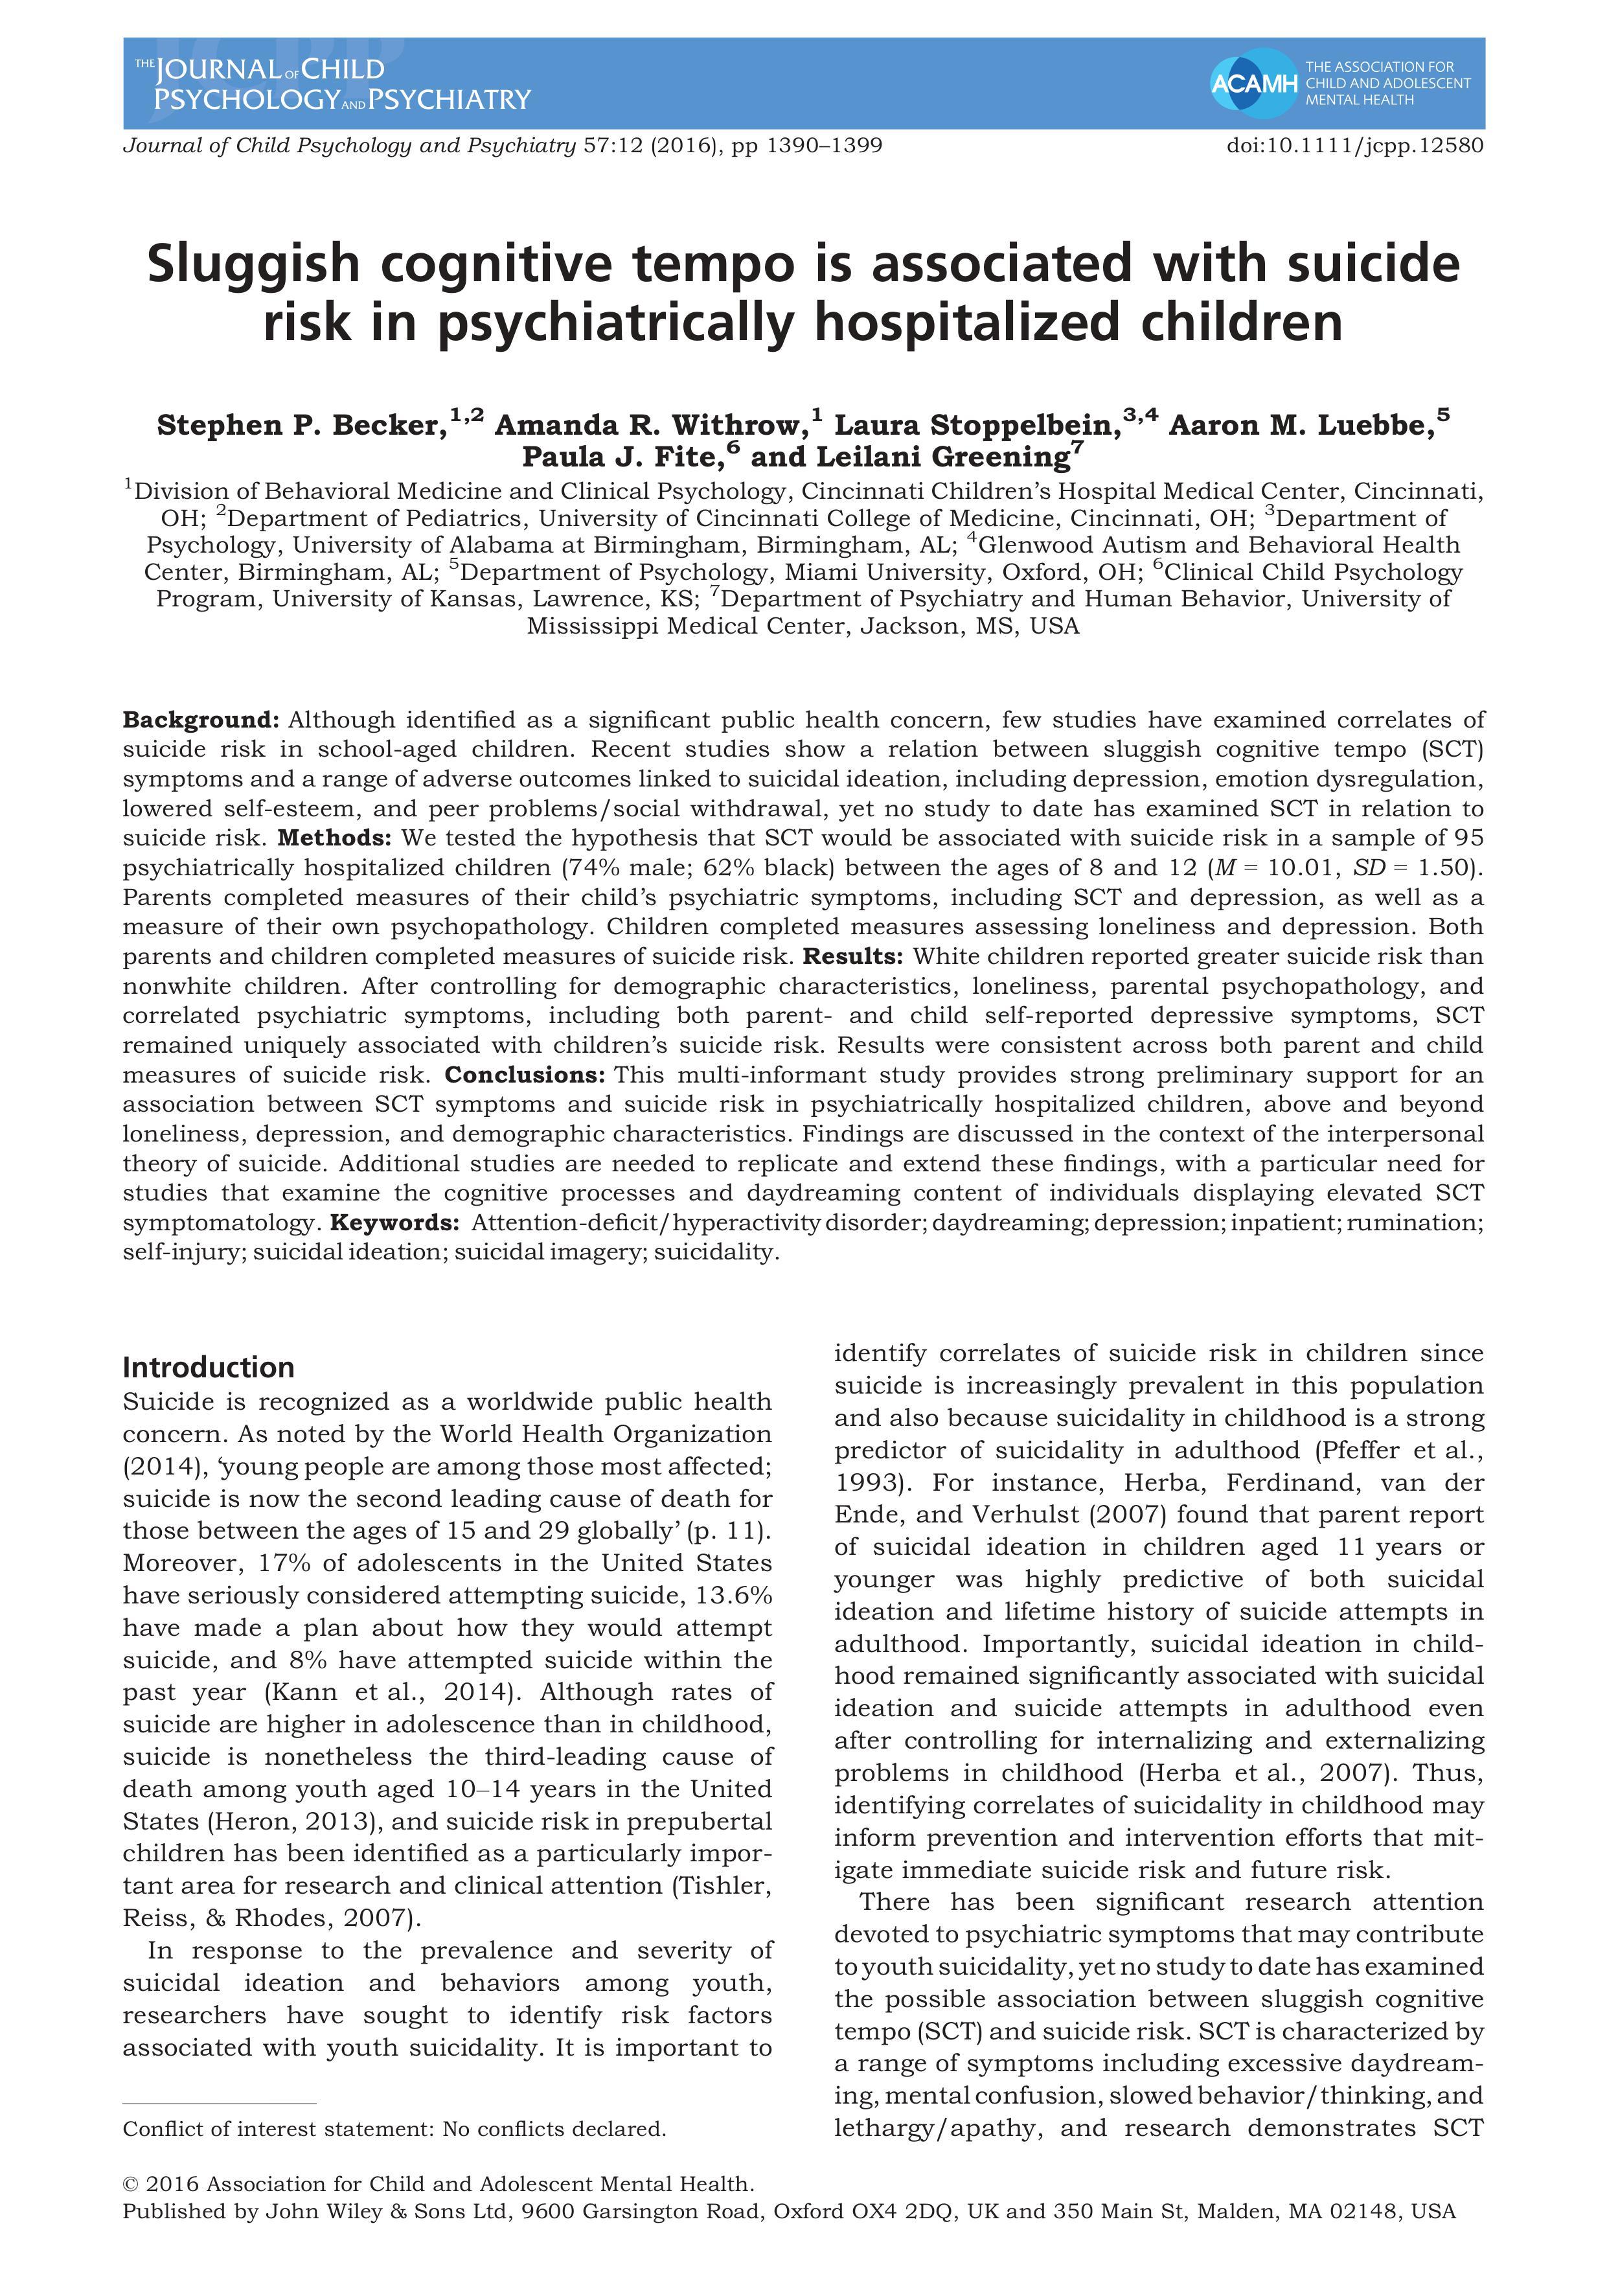 Becker et al (2015) JCPP SCT Suicide Risk.jpg